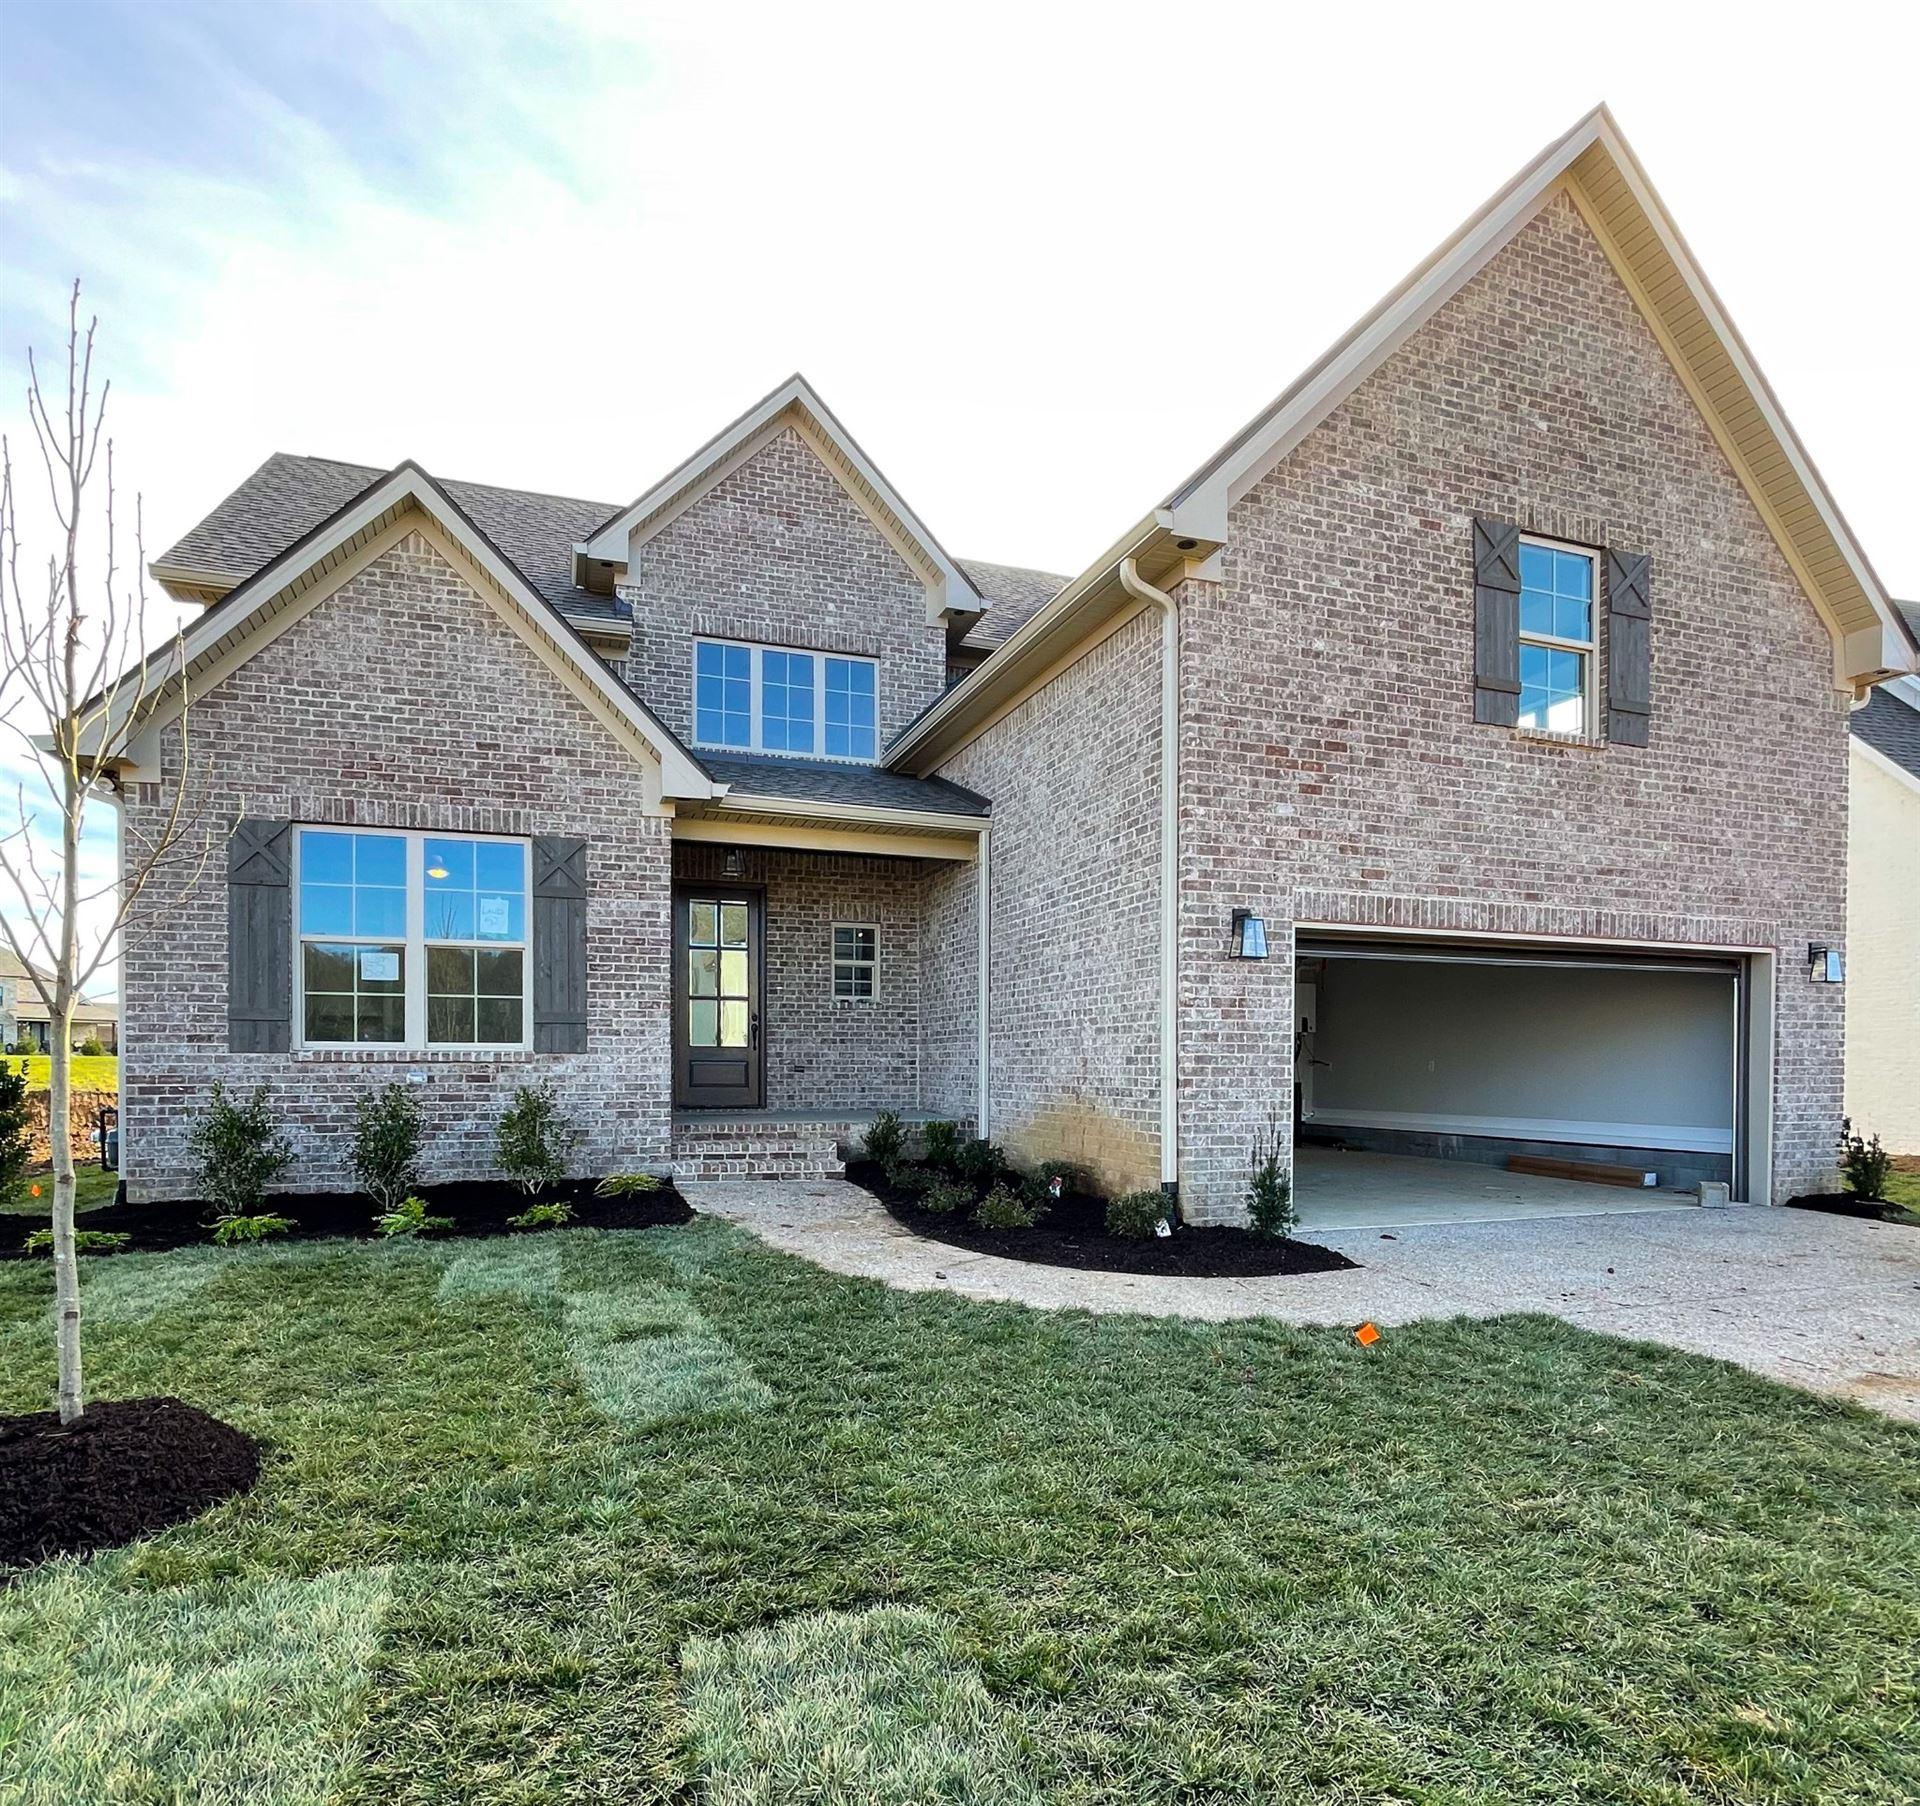 Photo of 1709 Sorrell Park Drive, Spring Hill, TN 37174 (MLS # 2286095)